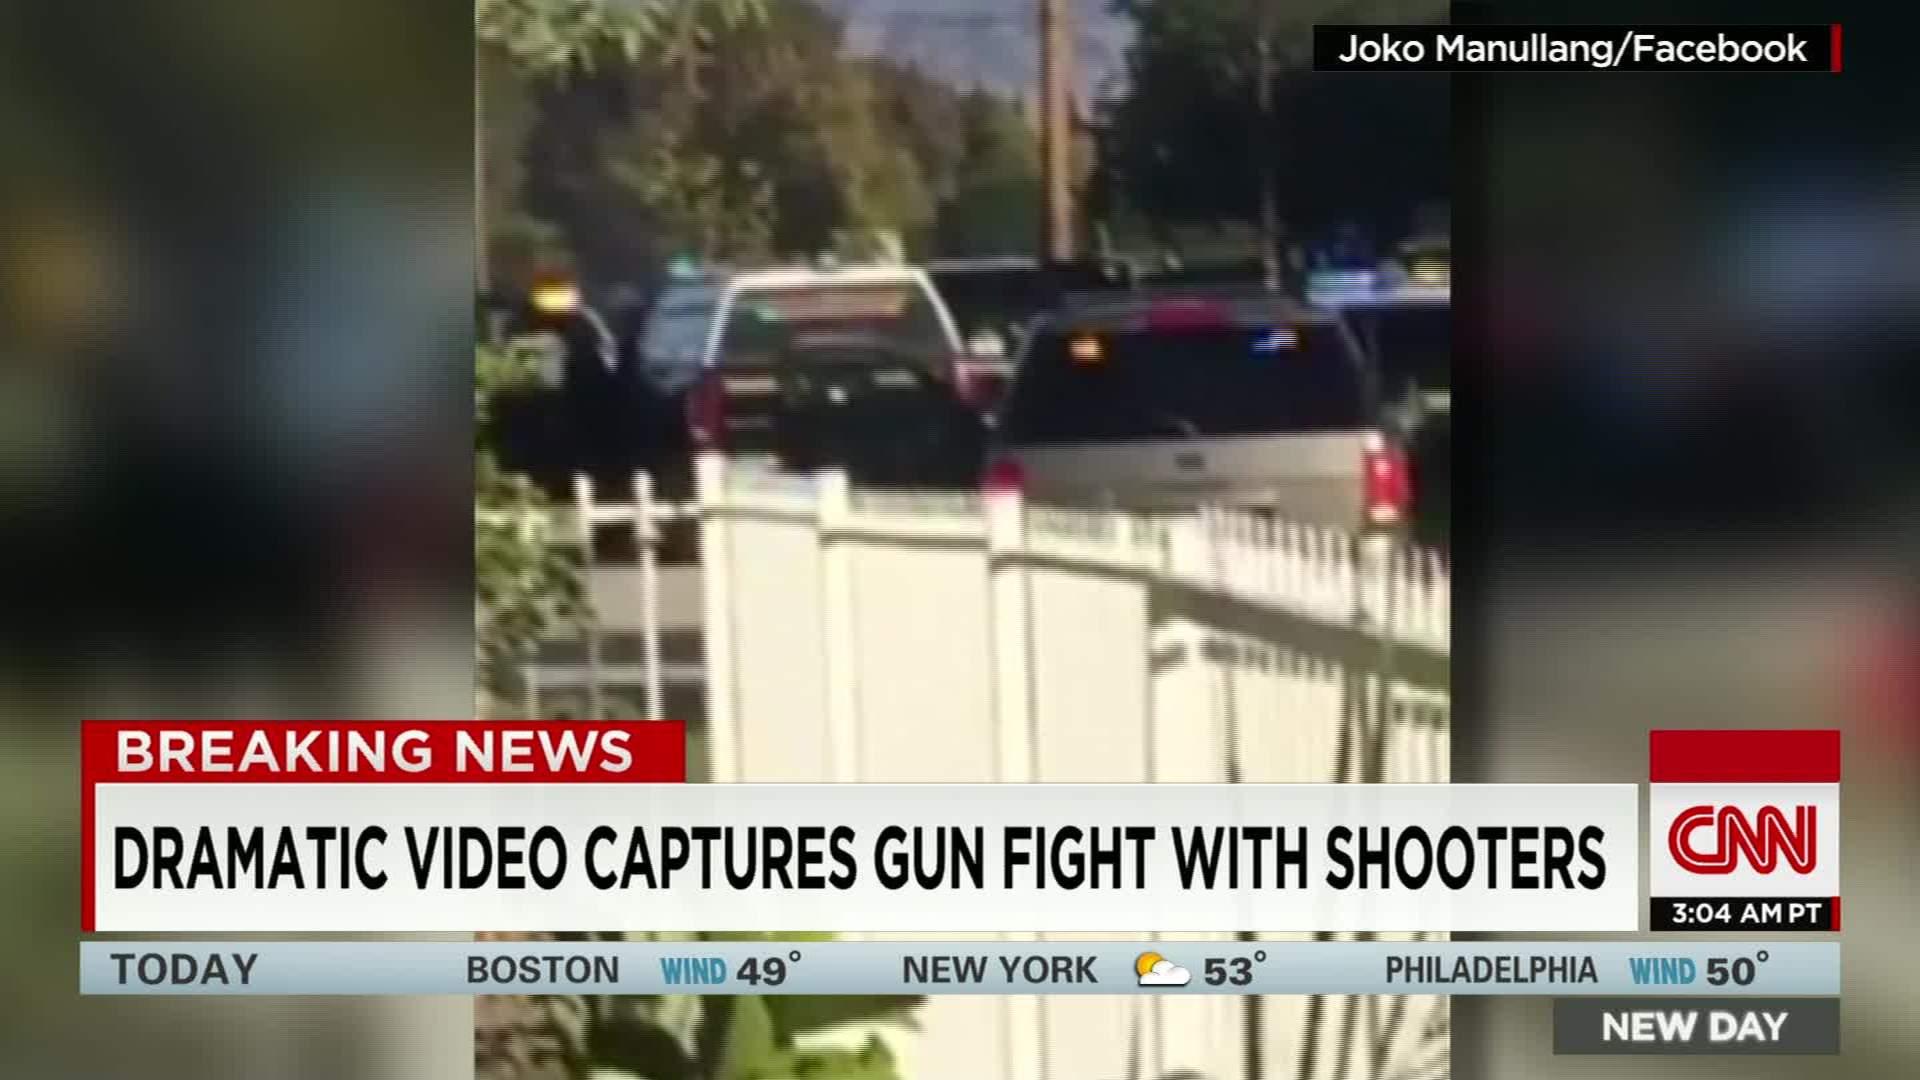 Dramatic video shows San Bernardino shootout - CNN Video